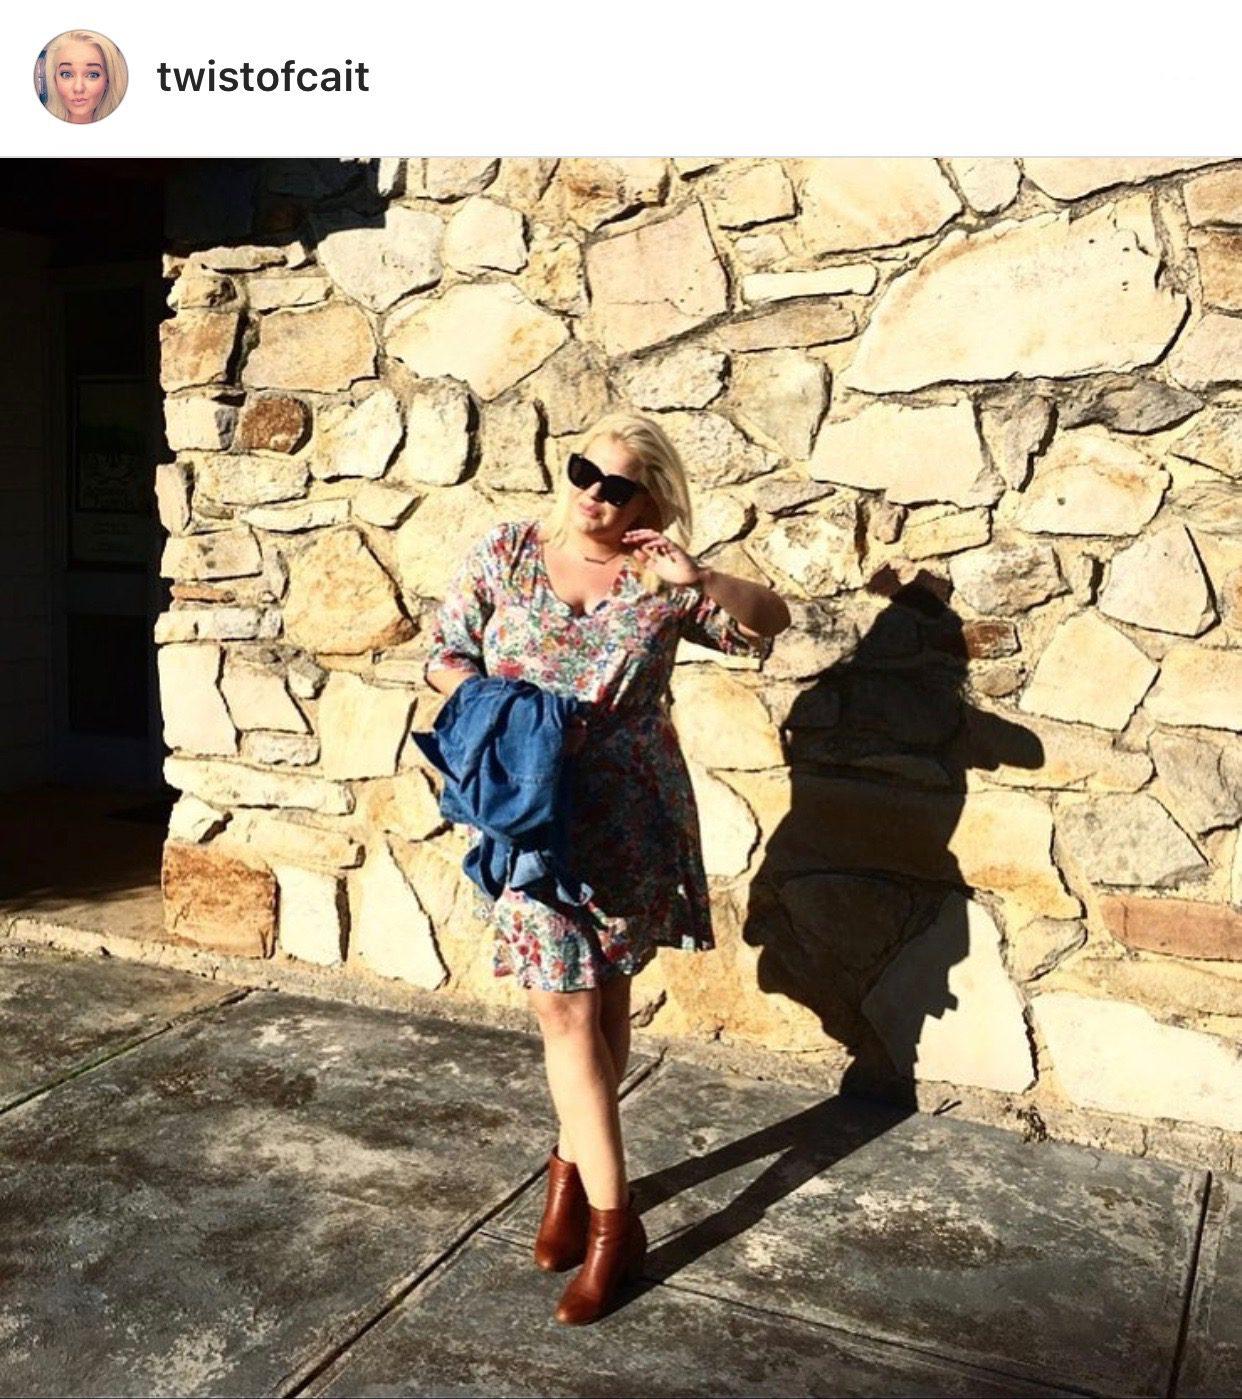 17 Plus-Size Instagram Accounts To Follow